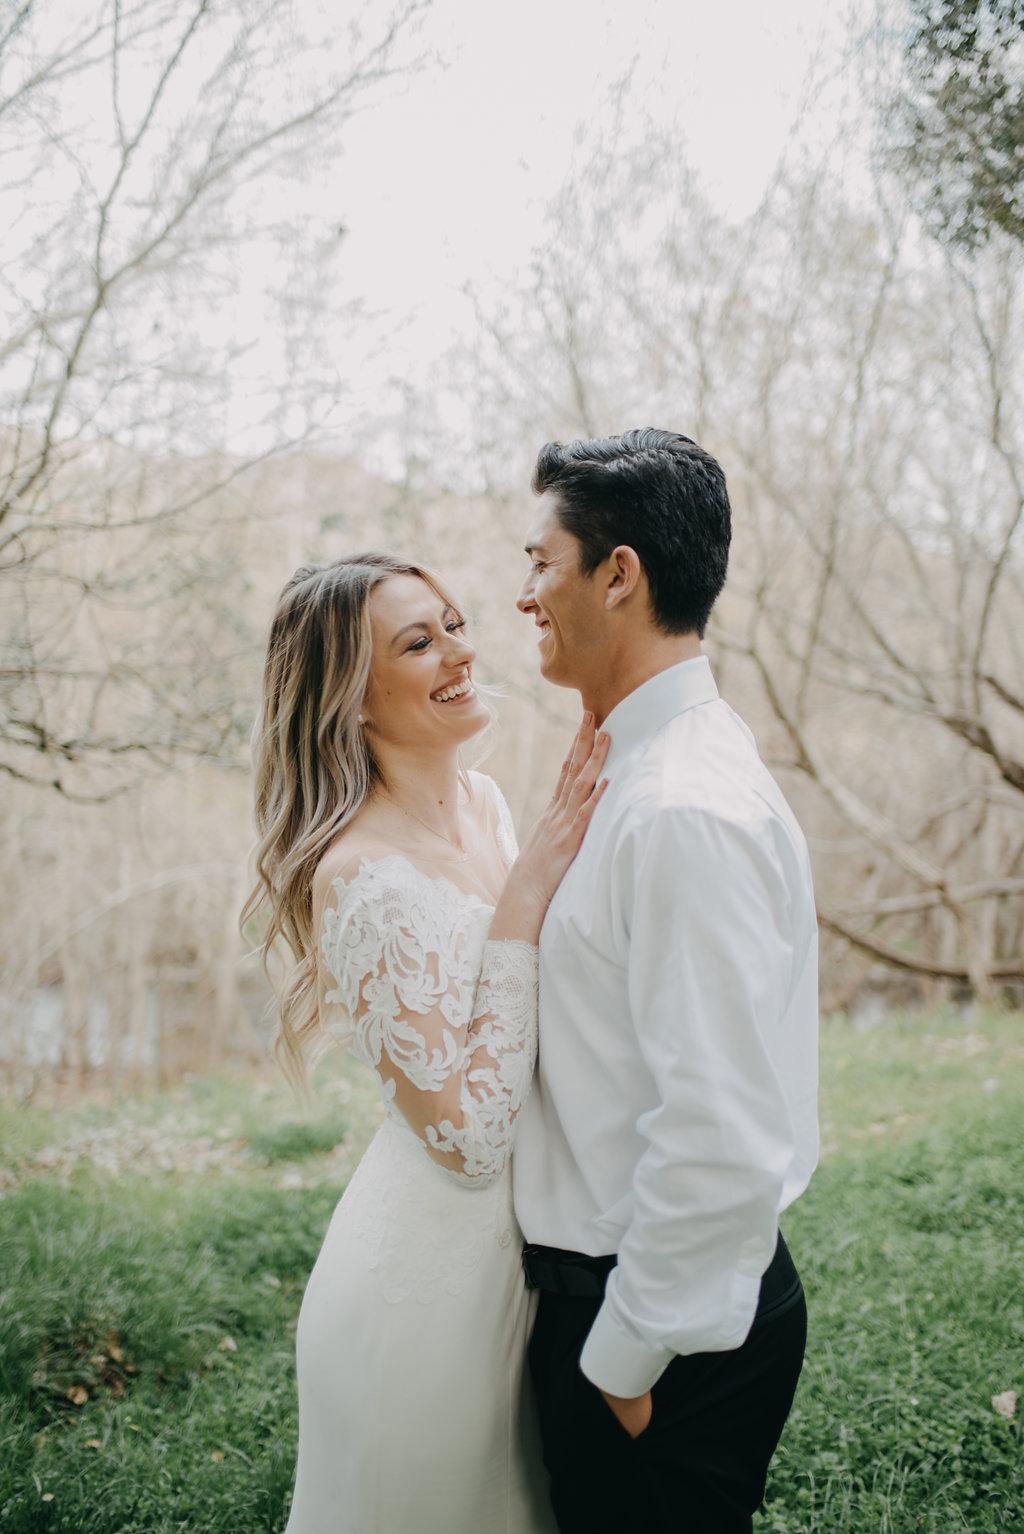 clean simple wedding dress for modern brides